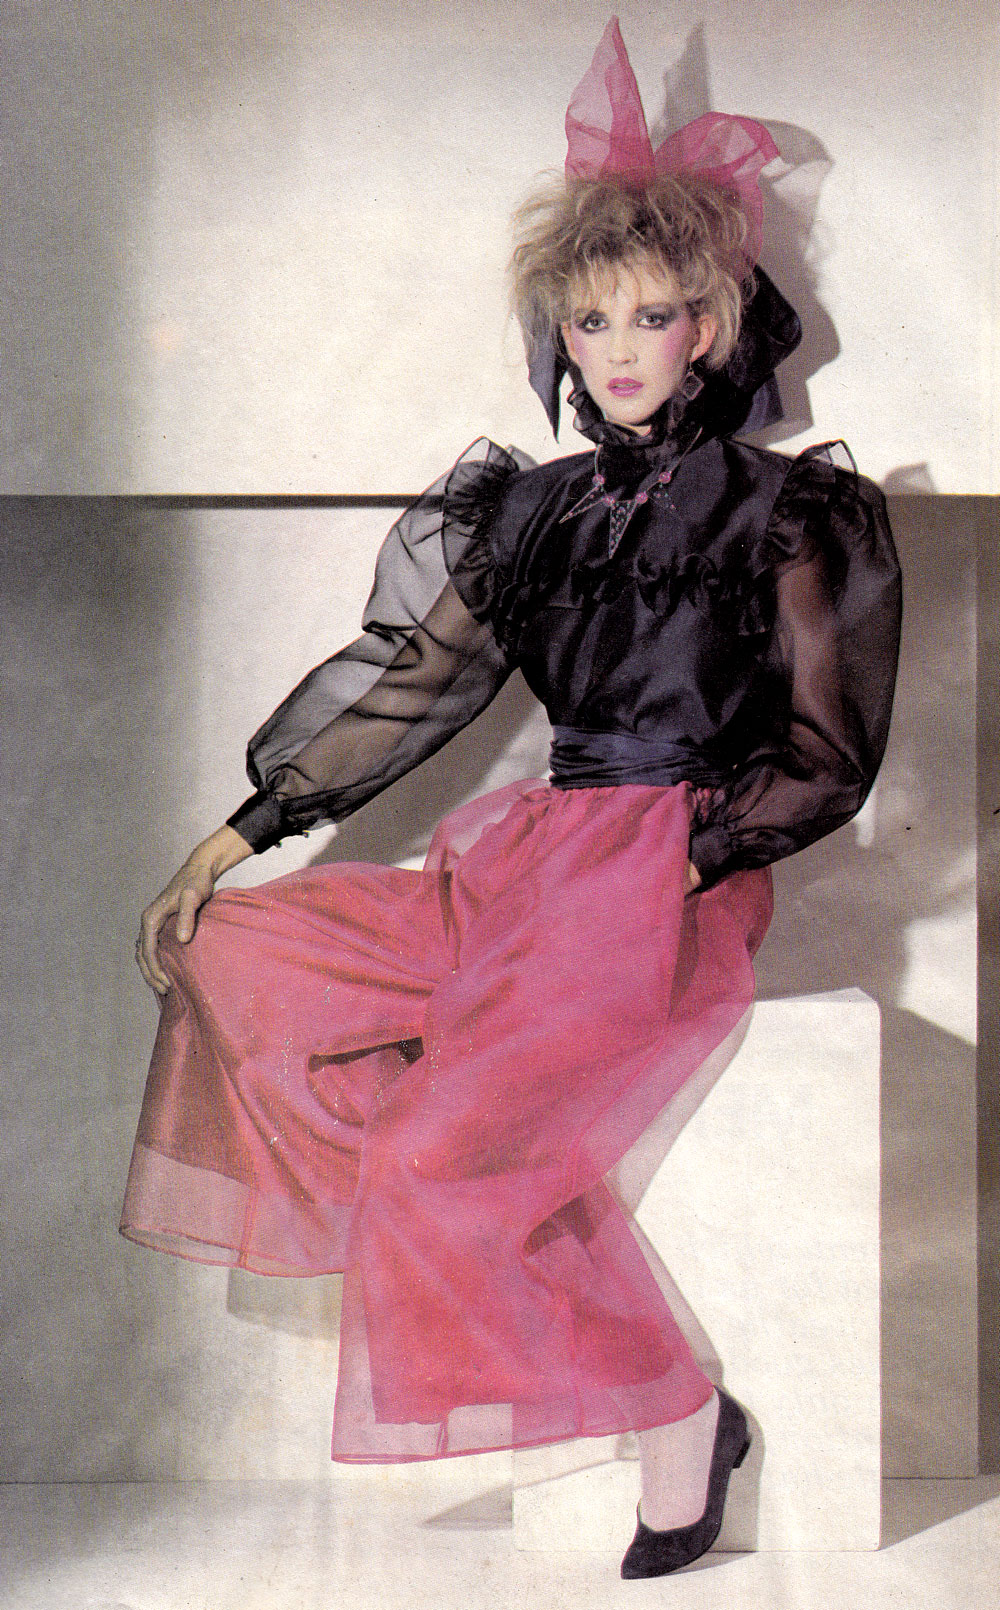 eily_doolan-john-rocha-fashion-feature-sunday-tribune-1982